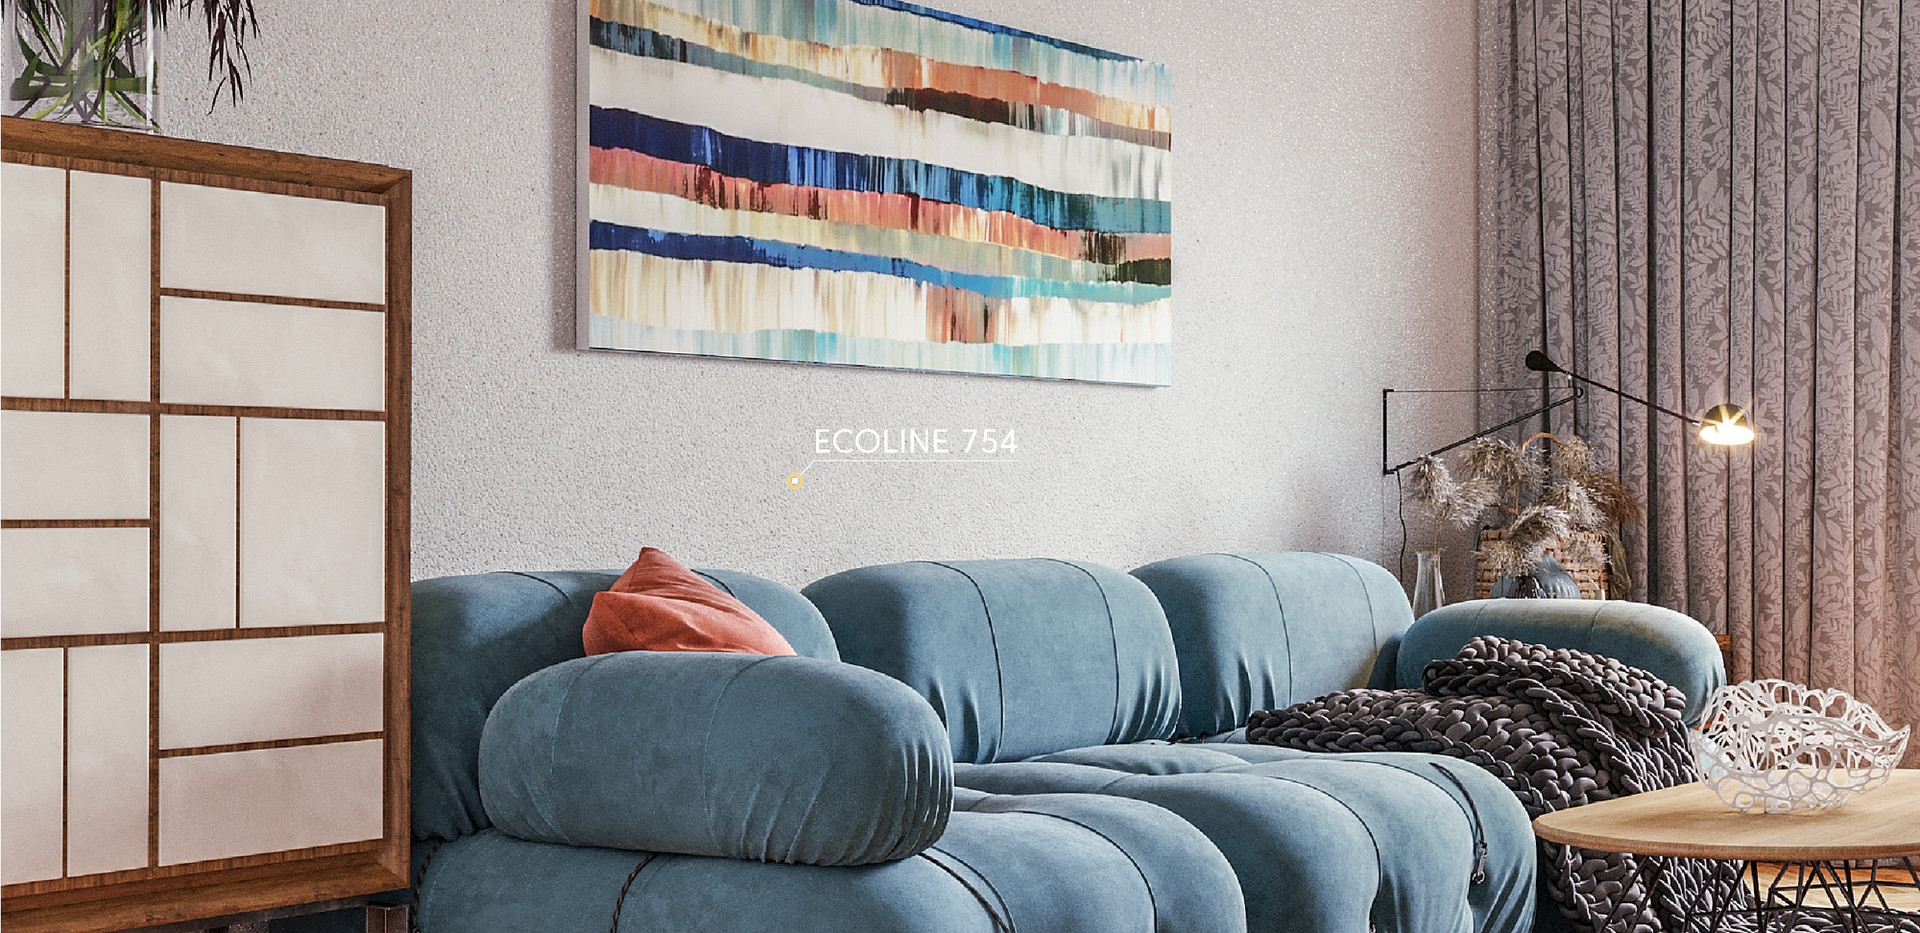 Ecoline 754_2.jpg